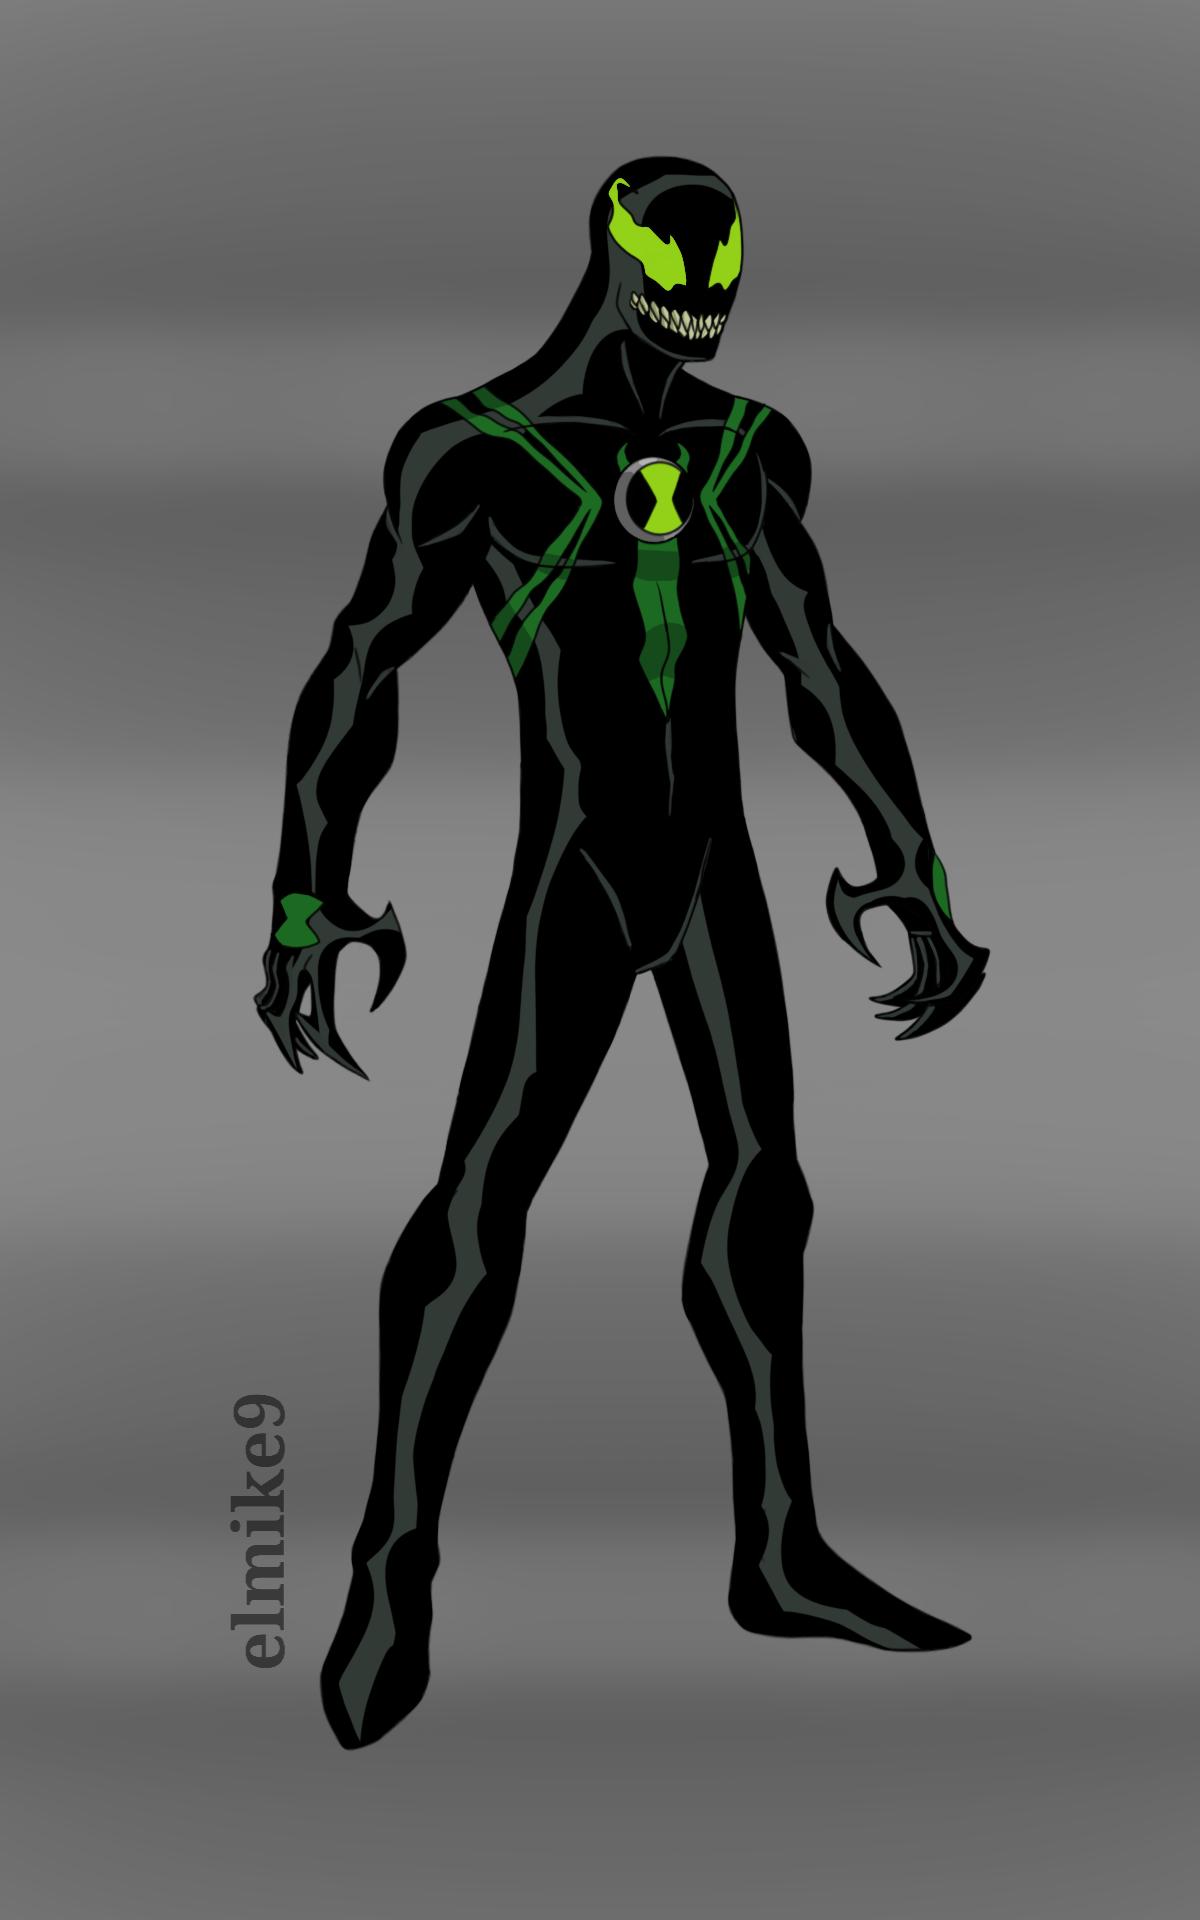 Boys Ben 10 Heatblast Alien TV Cartoon Superhero Fun Fancy Dress Costume Outfit